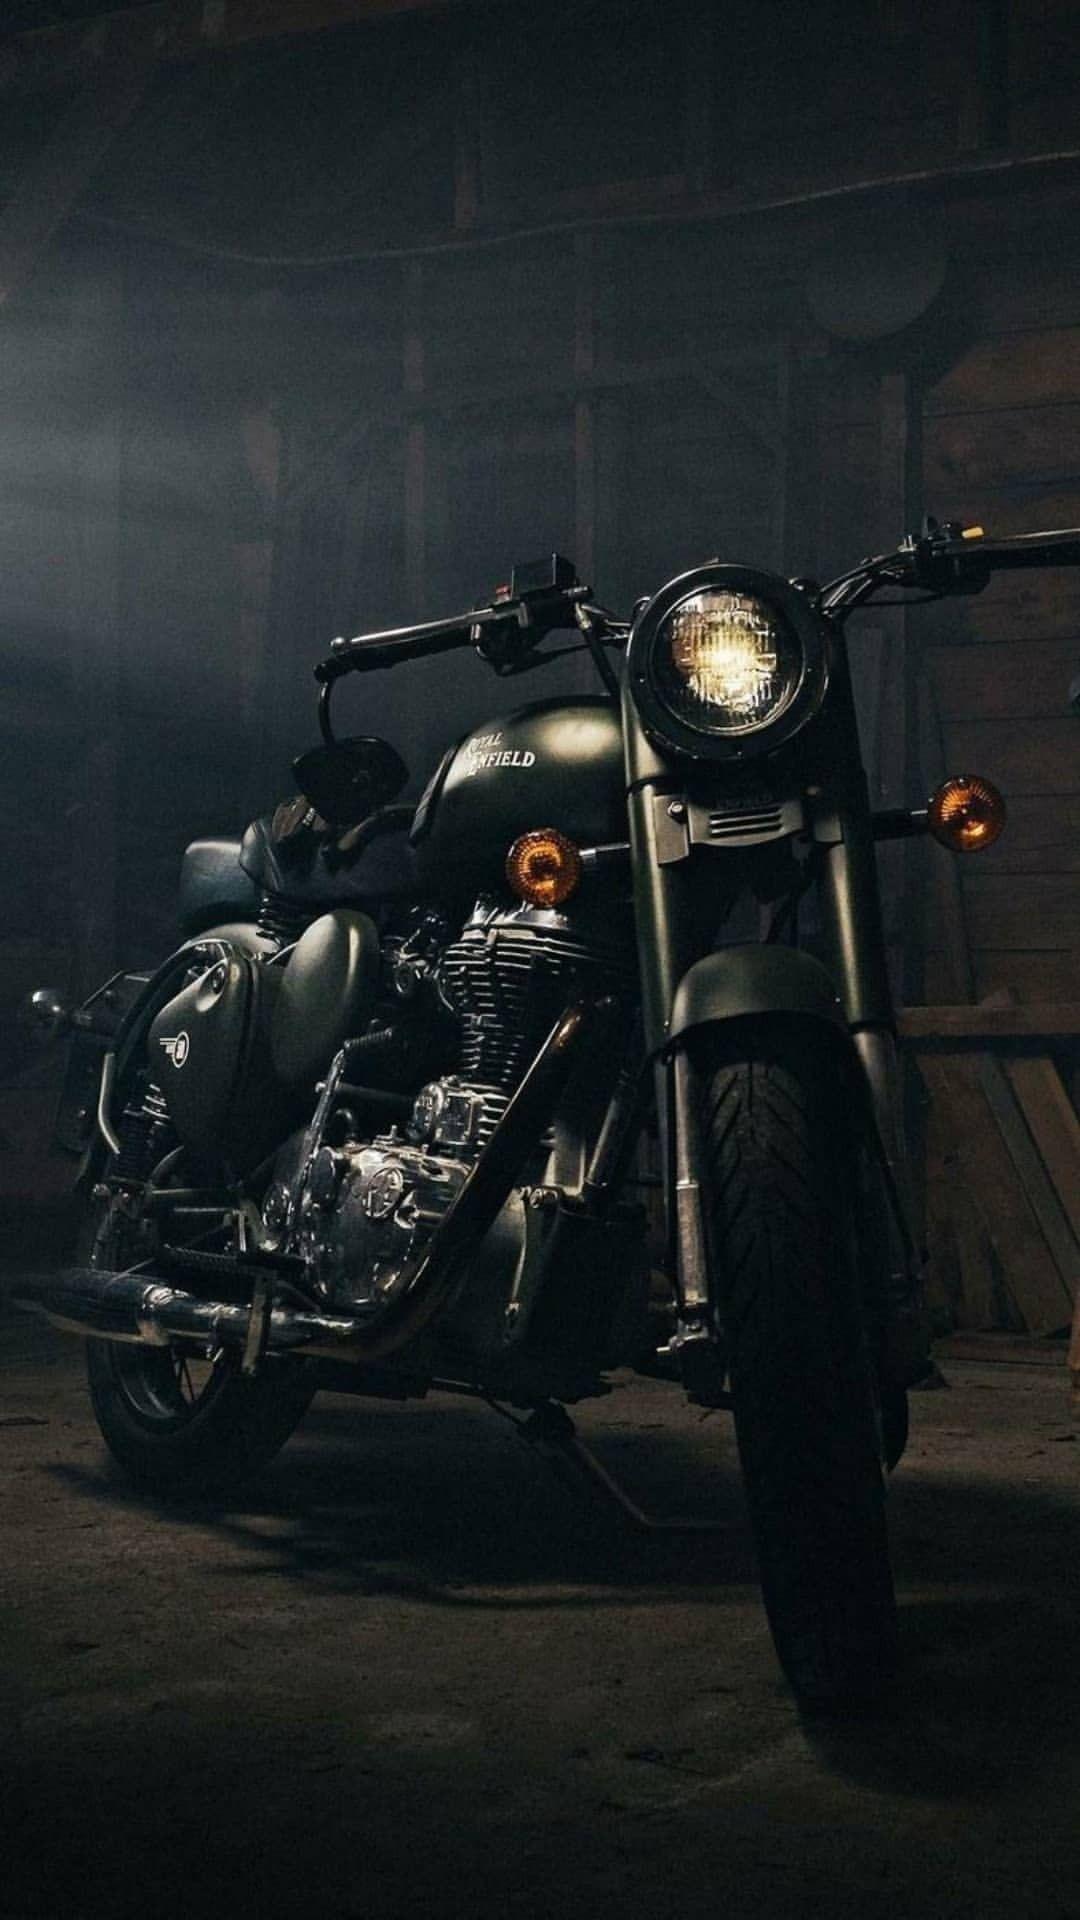 Pin By Digrai Borgoyari On Royal Enfield Bullet Bike Royal